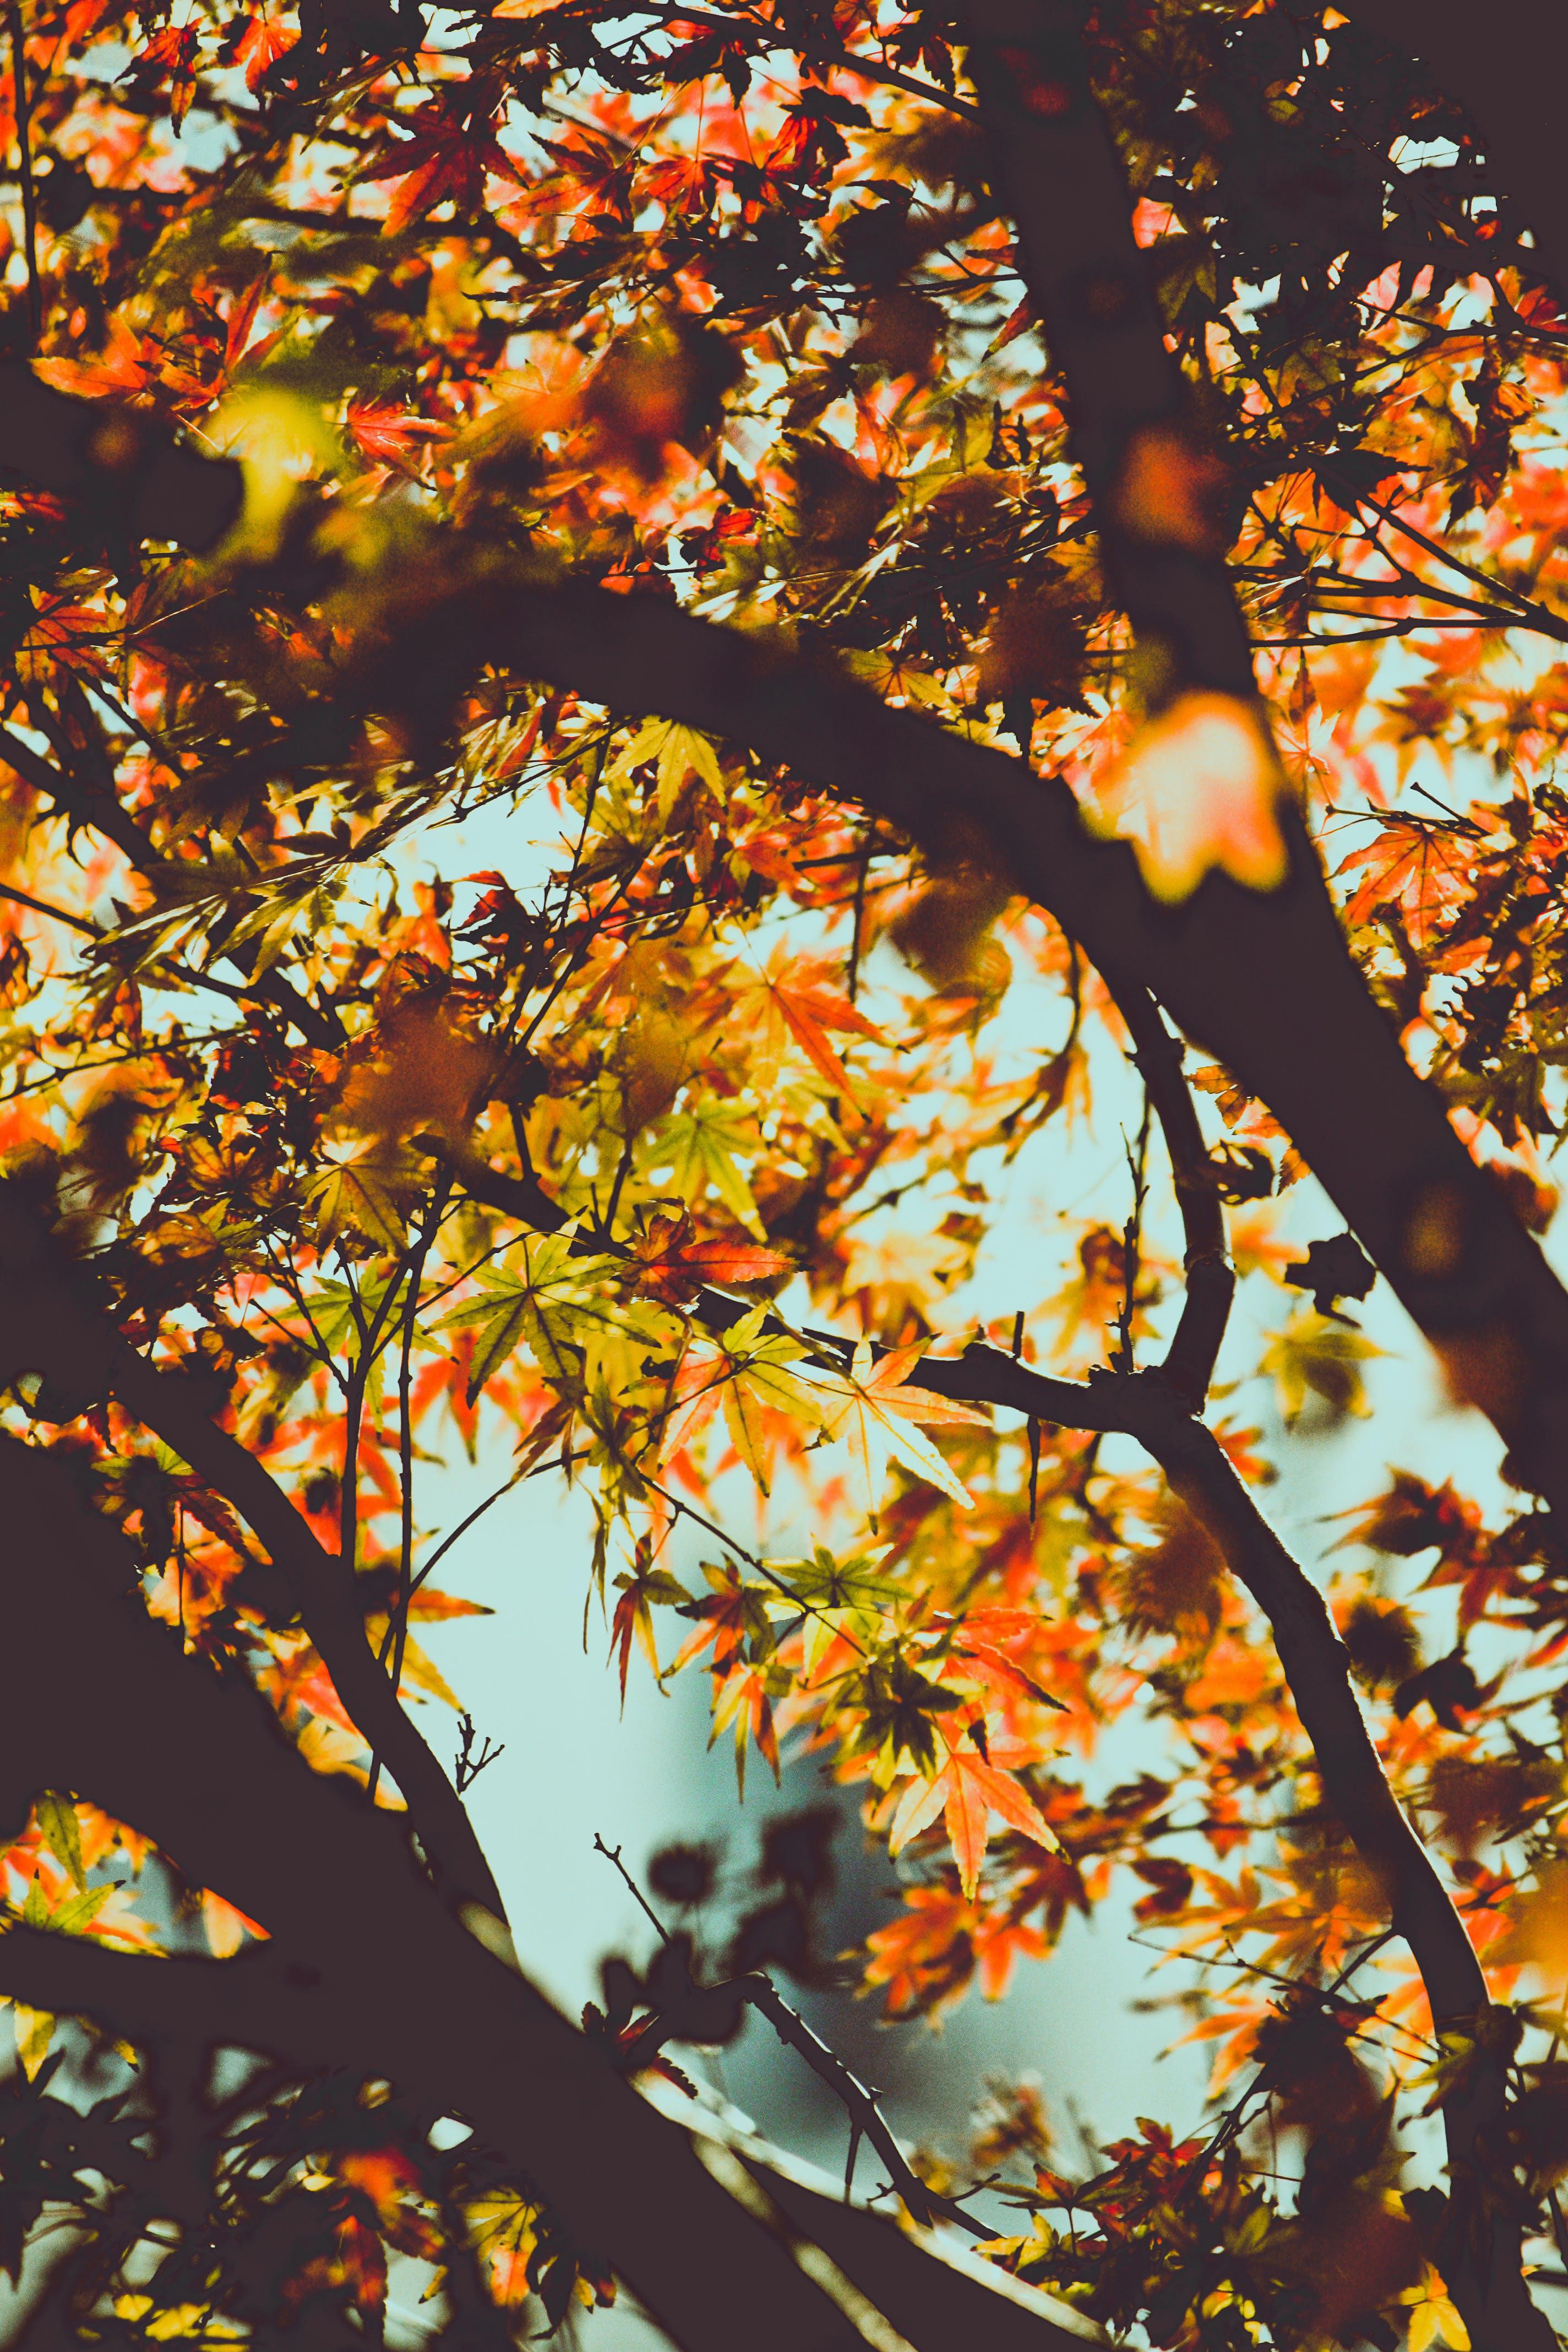 Free stock photo of leaves, tree, autumn, fall